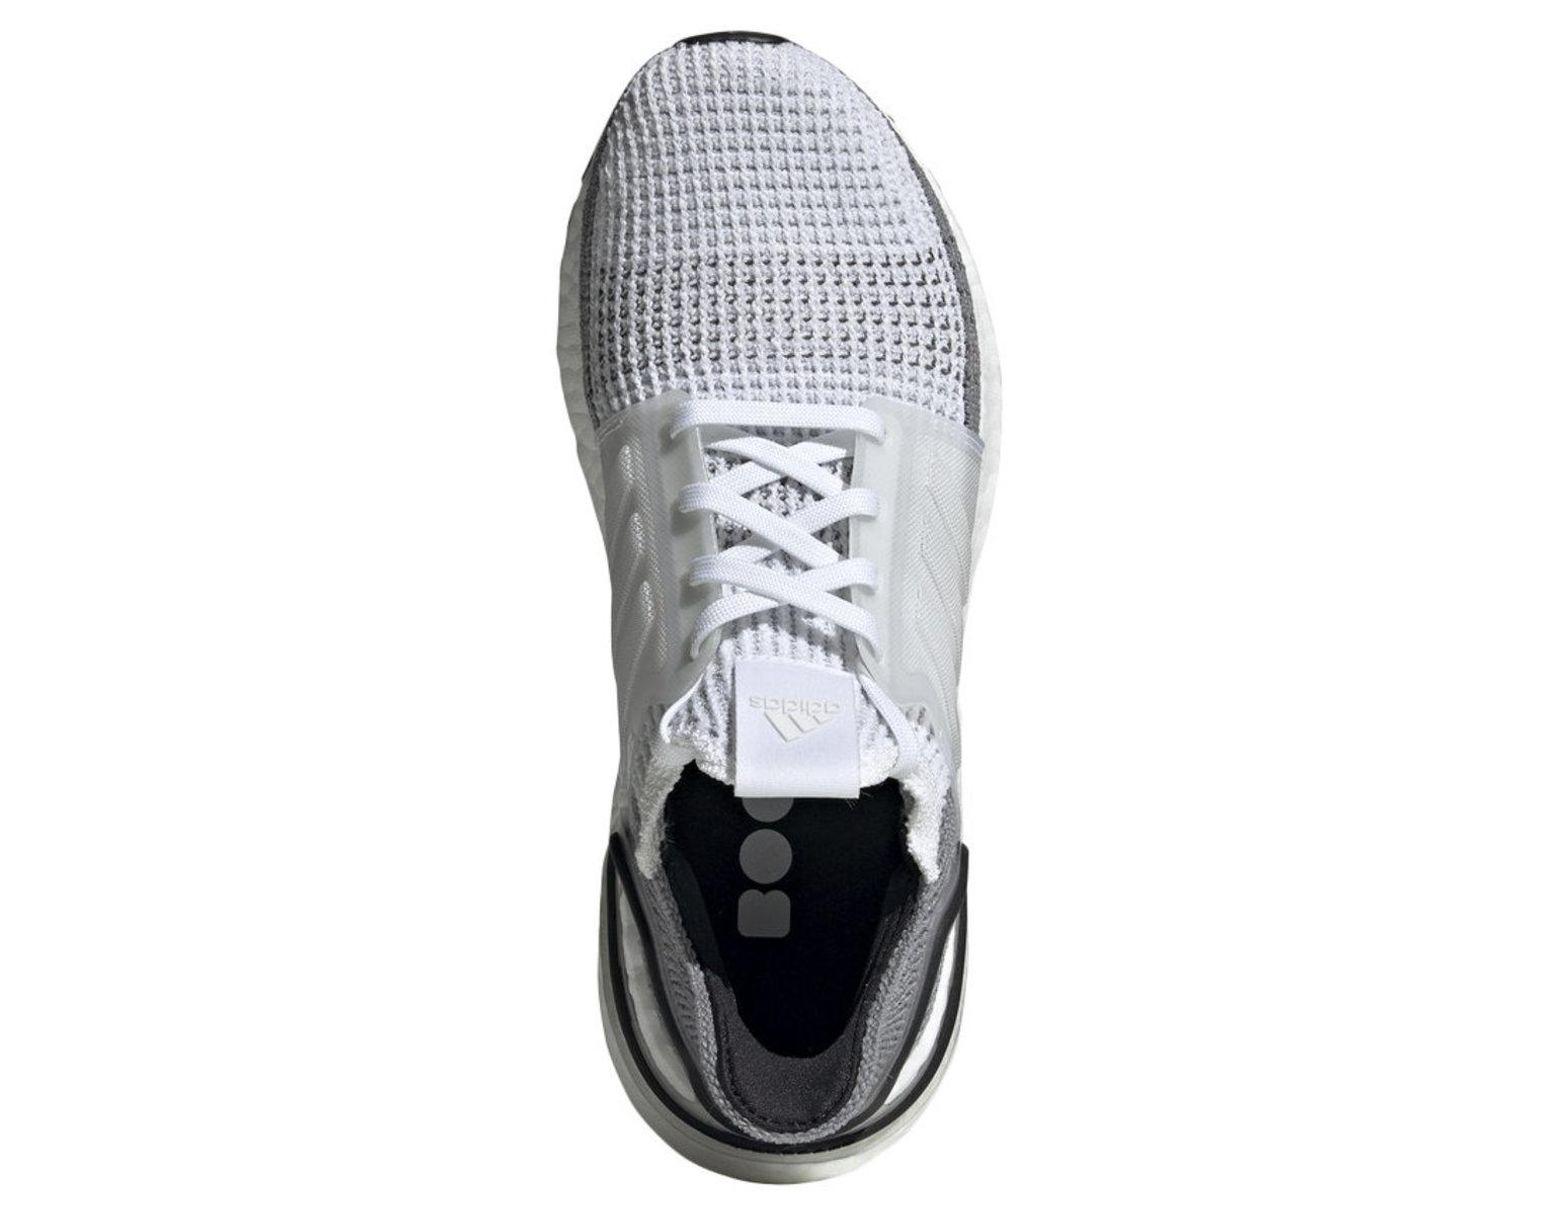 adidas UltraBoost, Shoes, Primeknit, Long, all adidas SG